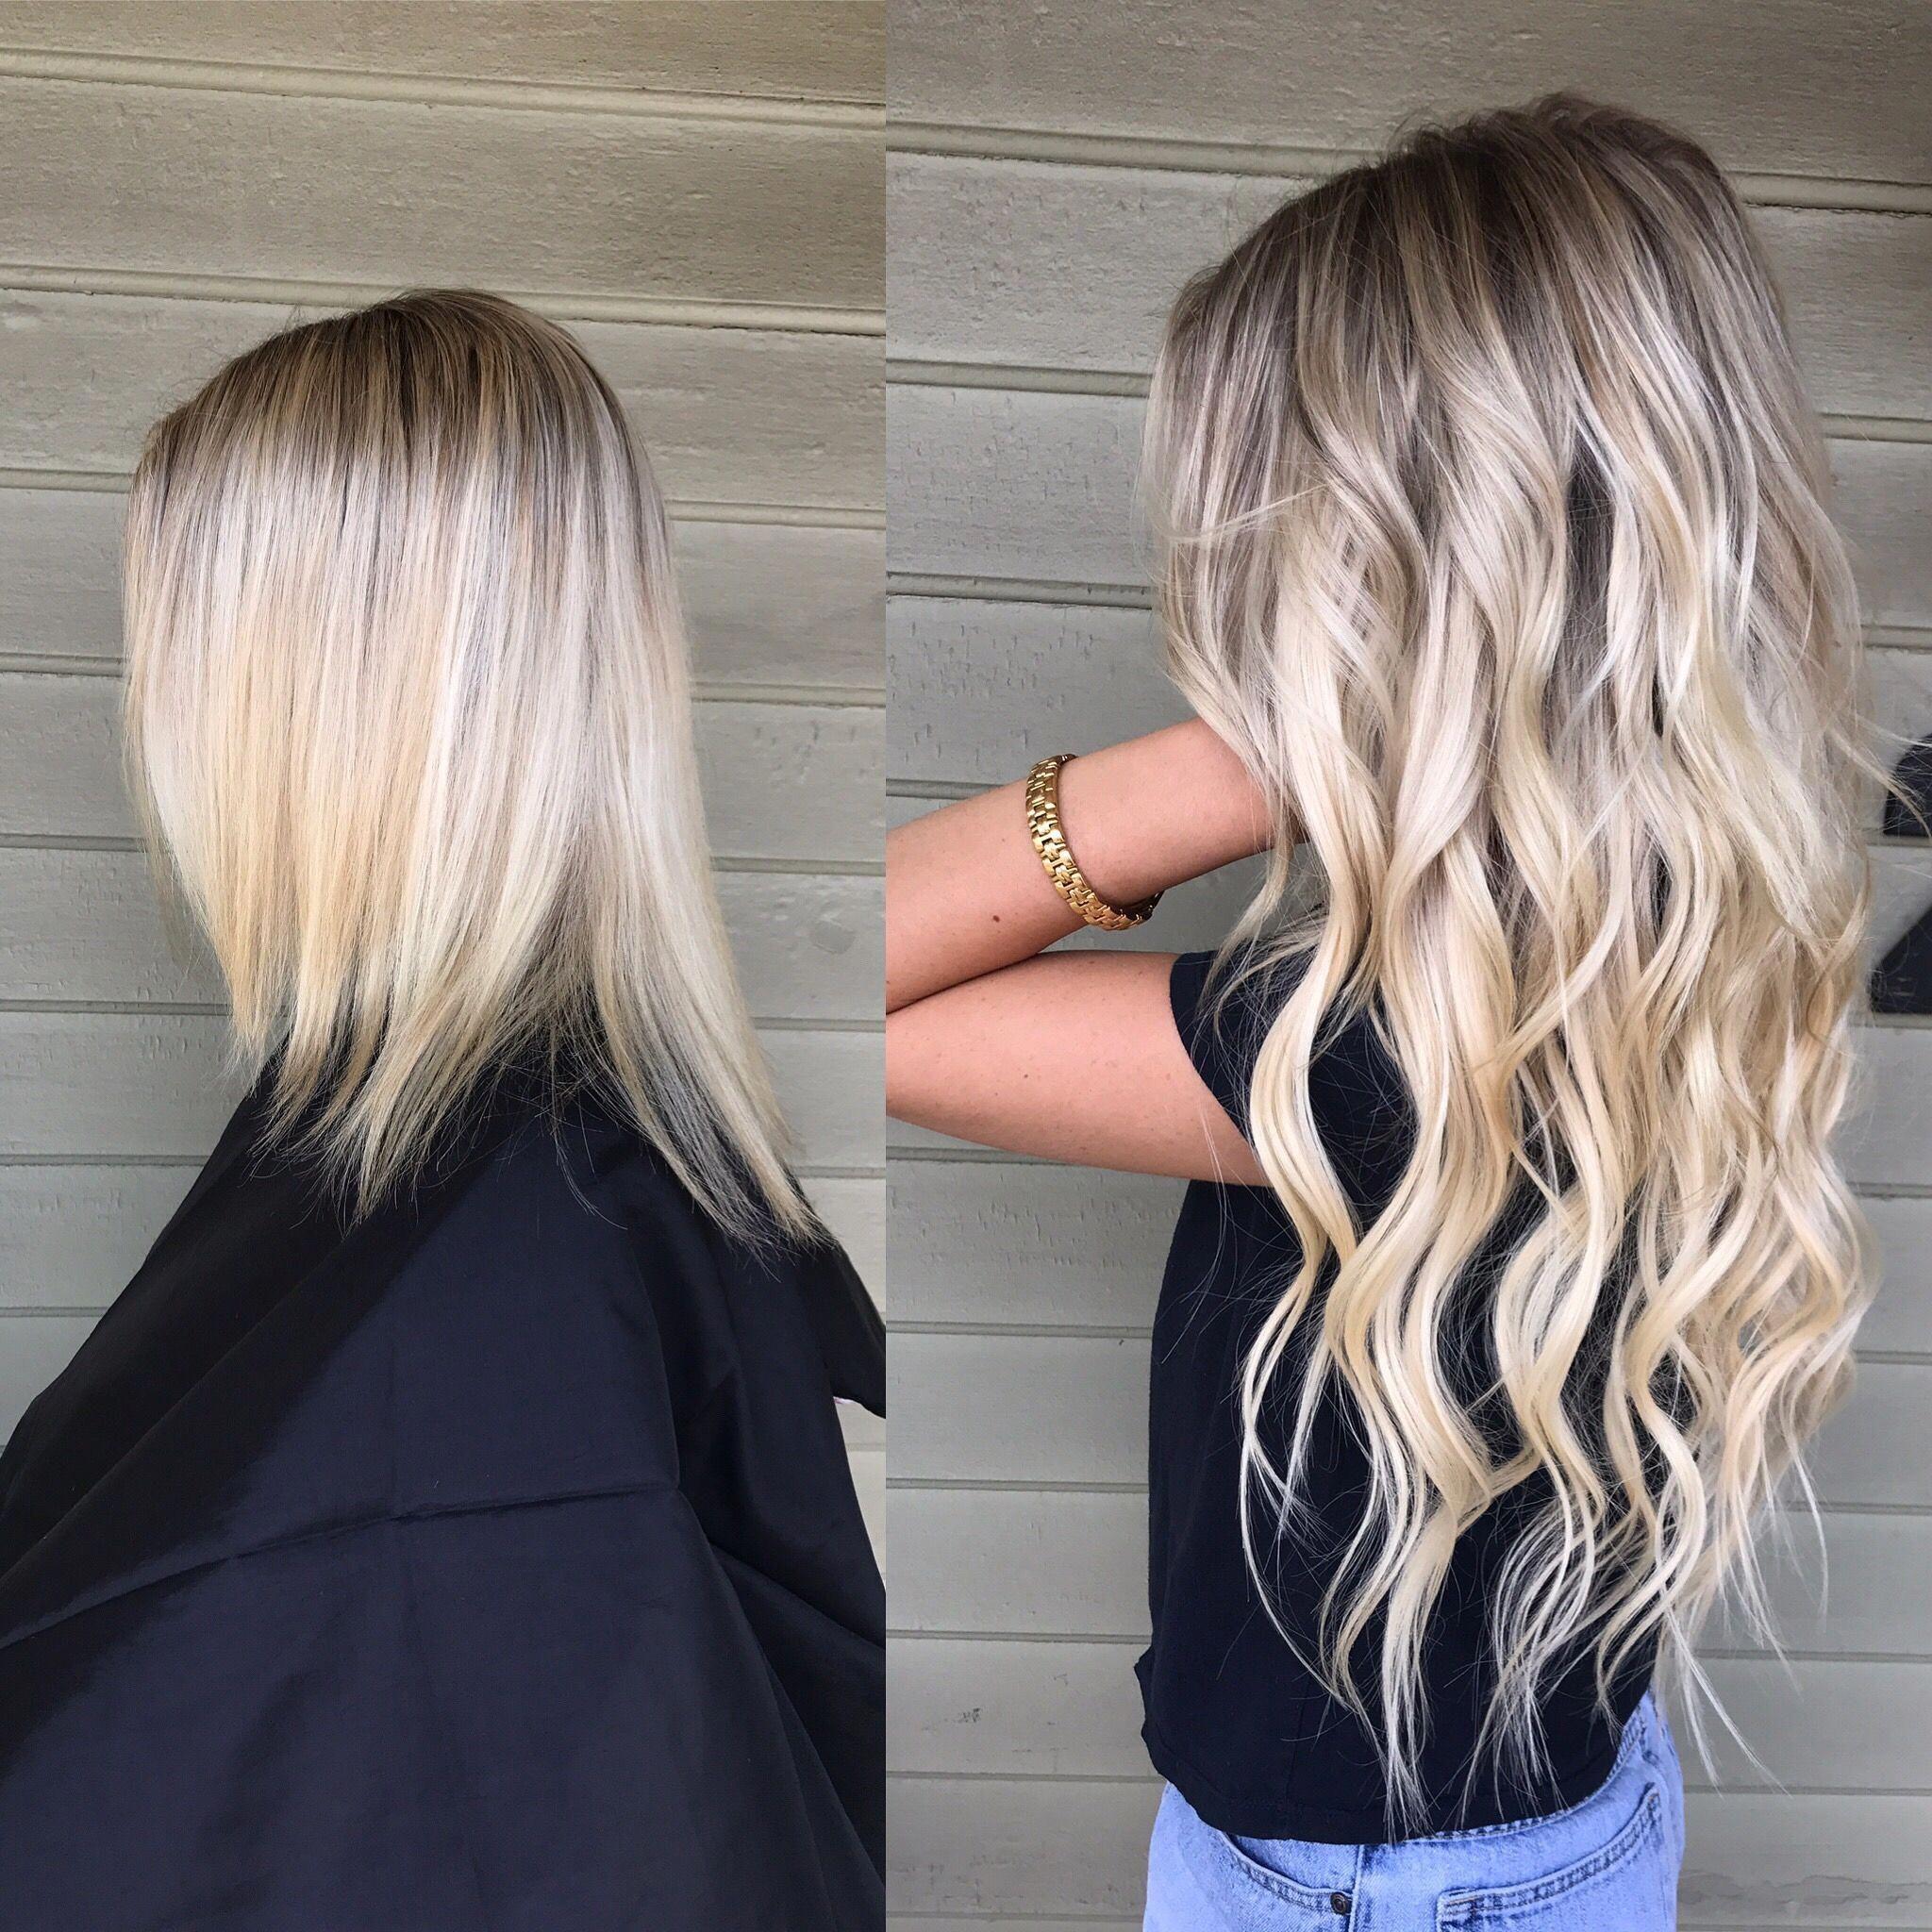 Blonde & Dreamcatchers hair extensions #Longandshort  Hair